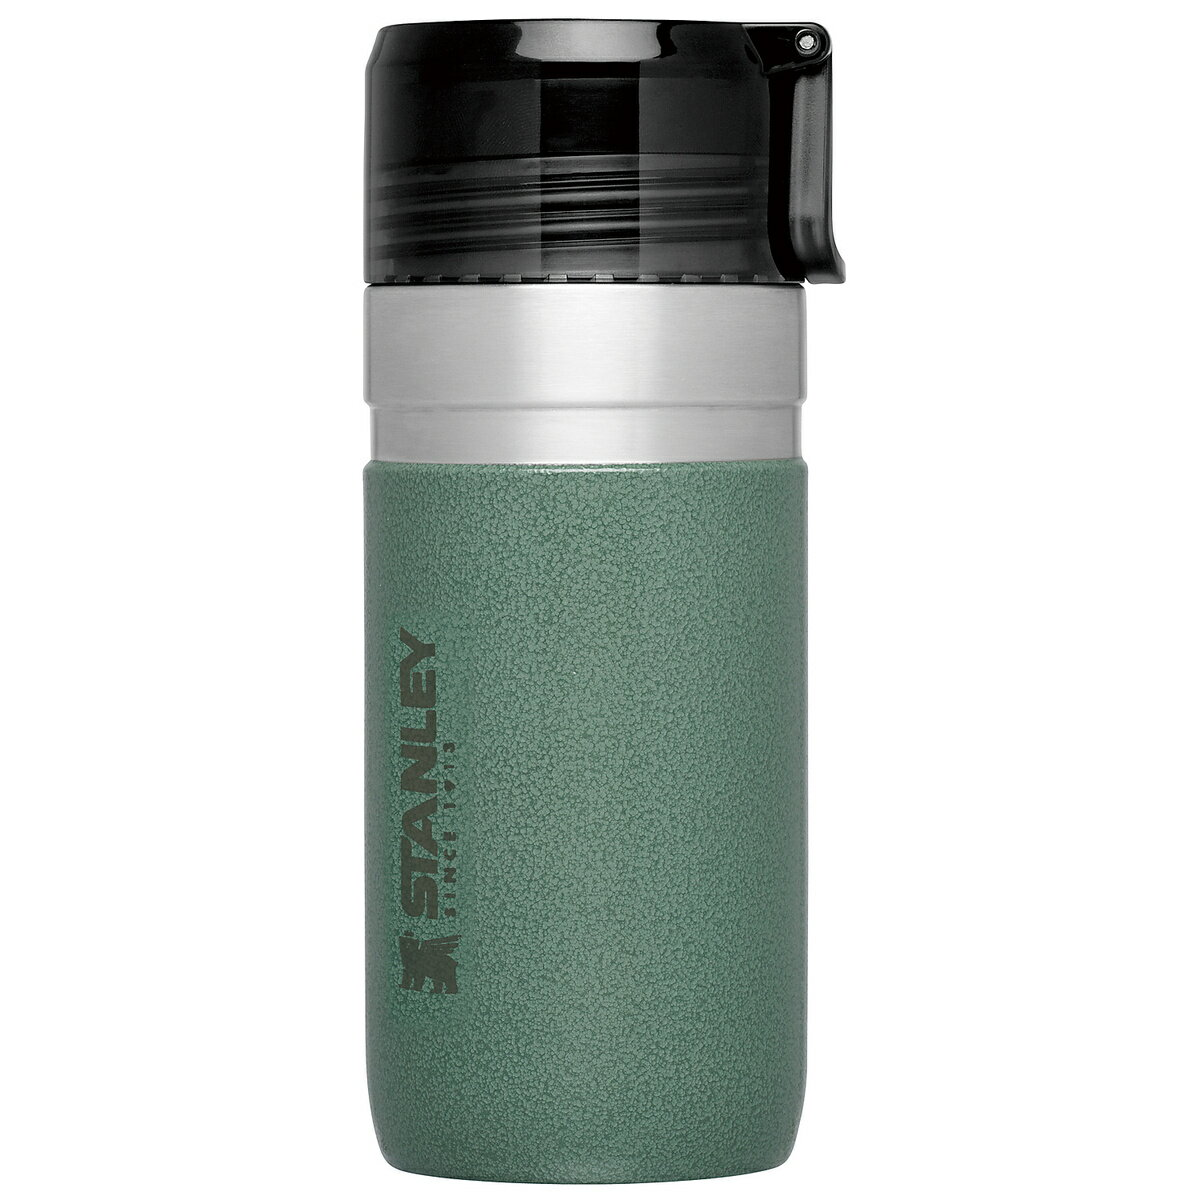 STANLEY(スタンレー) ゴーシリーズ 真空ボトル 0.47L